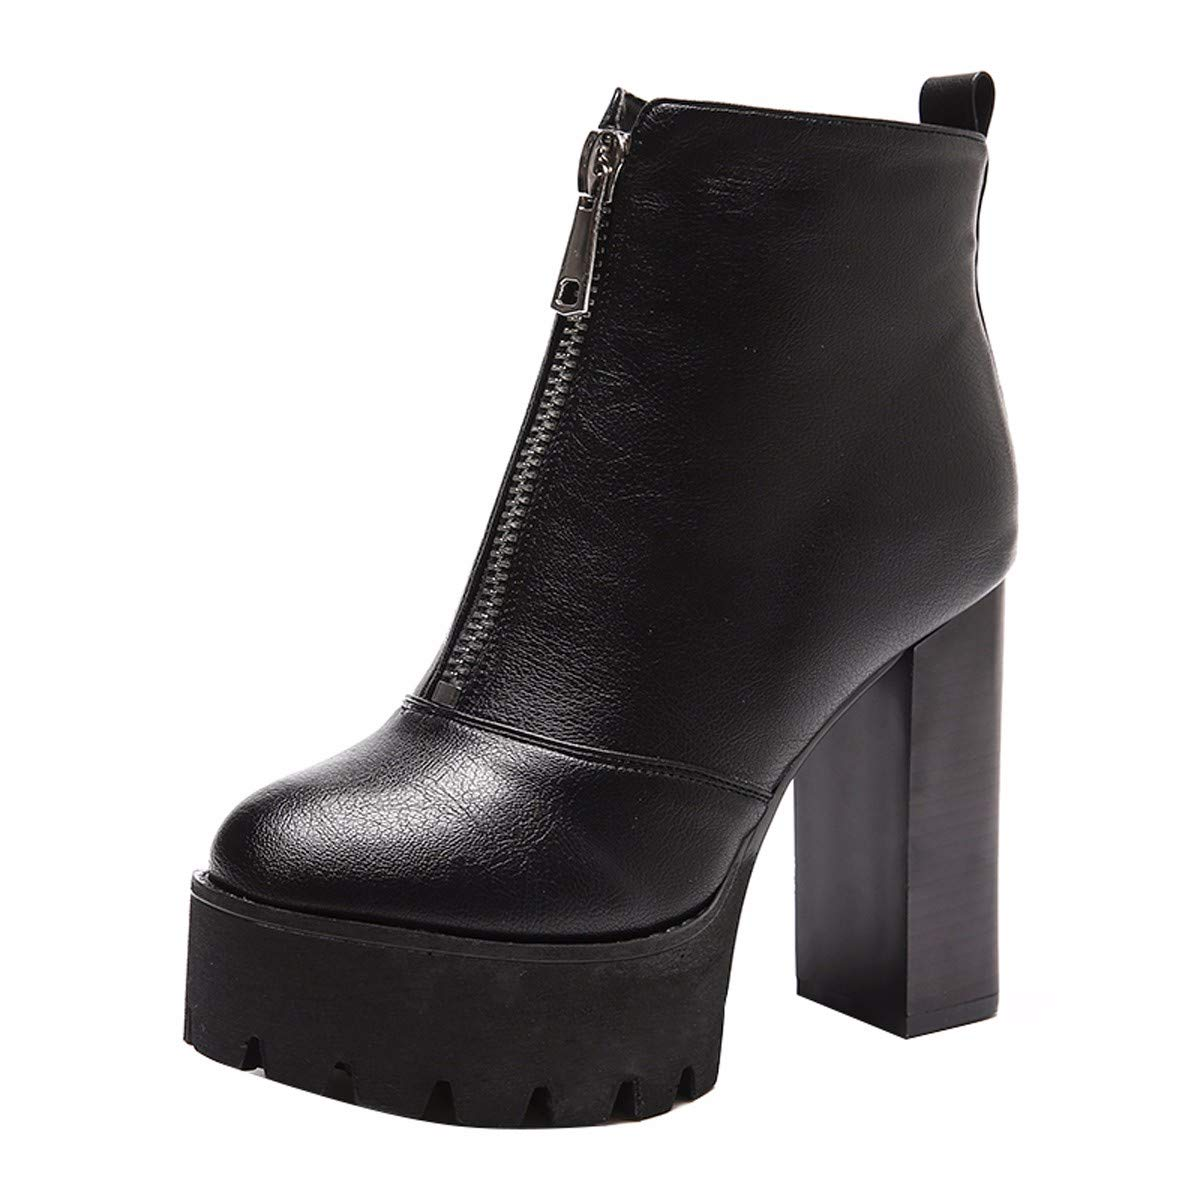 KPHY Damenschuhe - Reißverschluss Samt Stiefeln Heel 12 Mode cm Mode 12 100 Sätze Dicke Sohle Martin Stiefel 593990